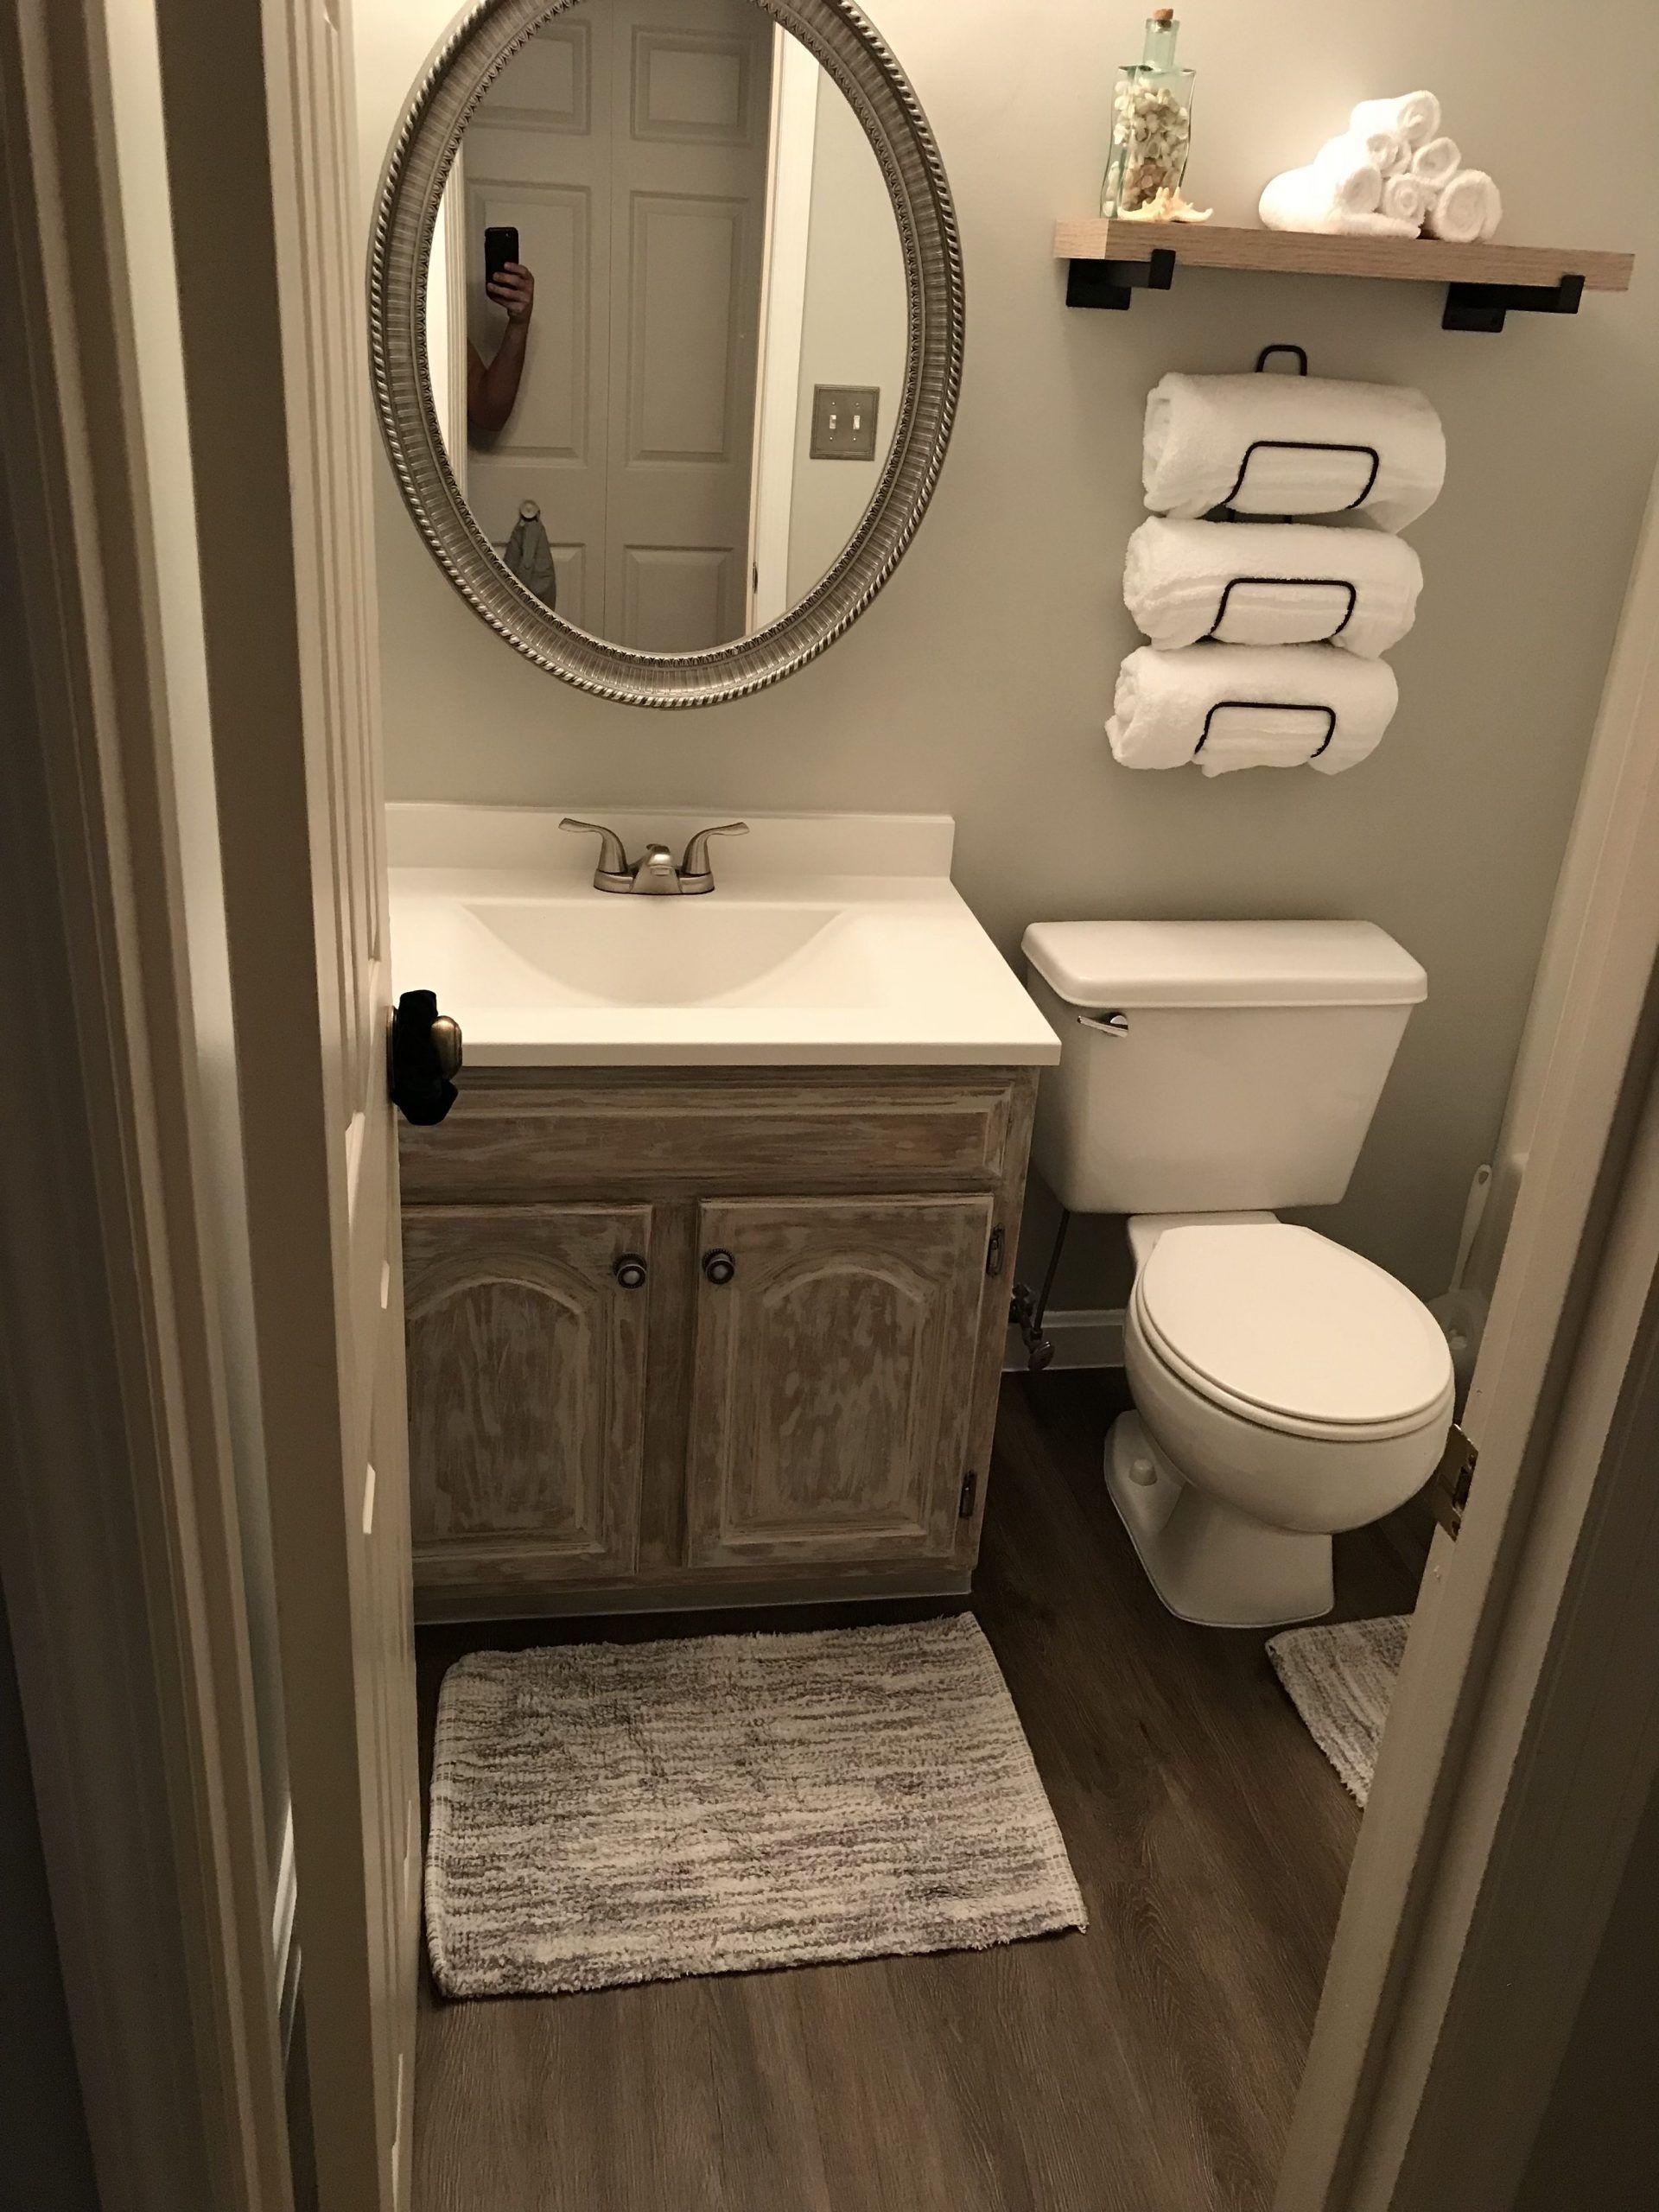 25 Beautiful Bathroom Color Scheme Ideas For Small Master Bathroom Bathroom Beautiful Color Ide In 2020 Small Bathroom Decor Office Bathroom Design Bathroom Decor